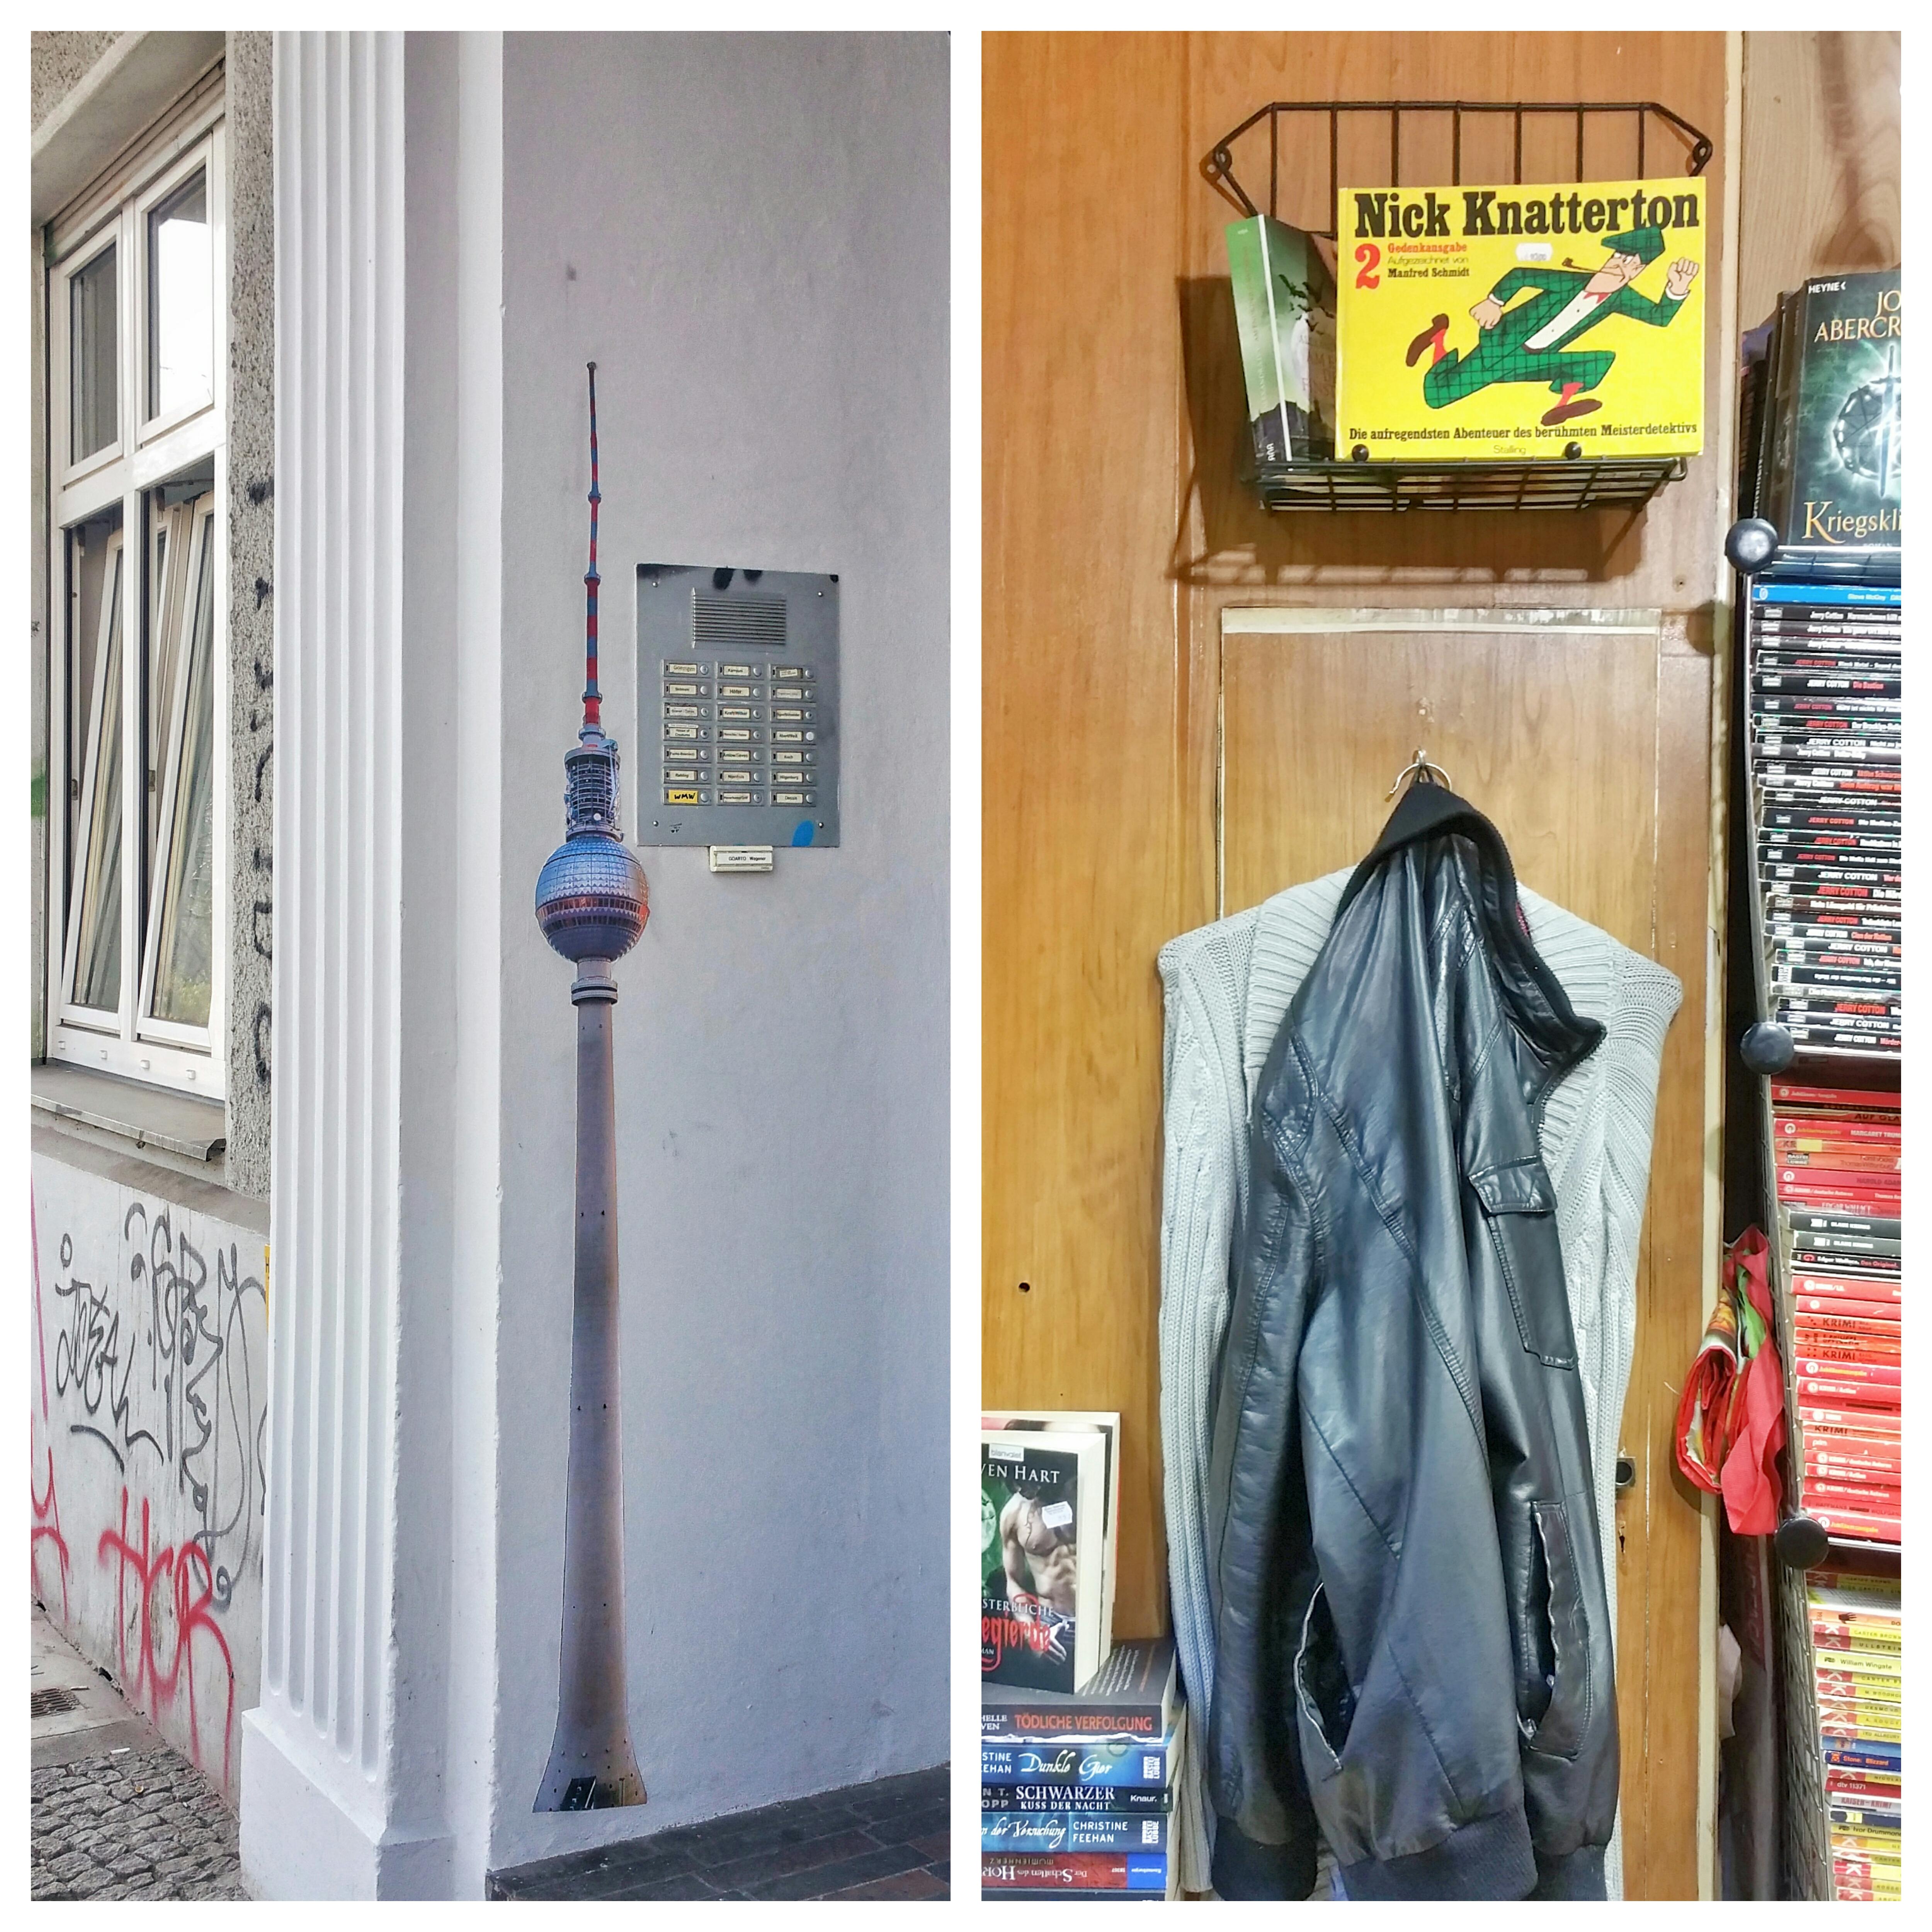 Nick Knatterton |Ales |berlin